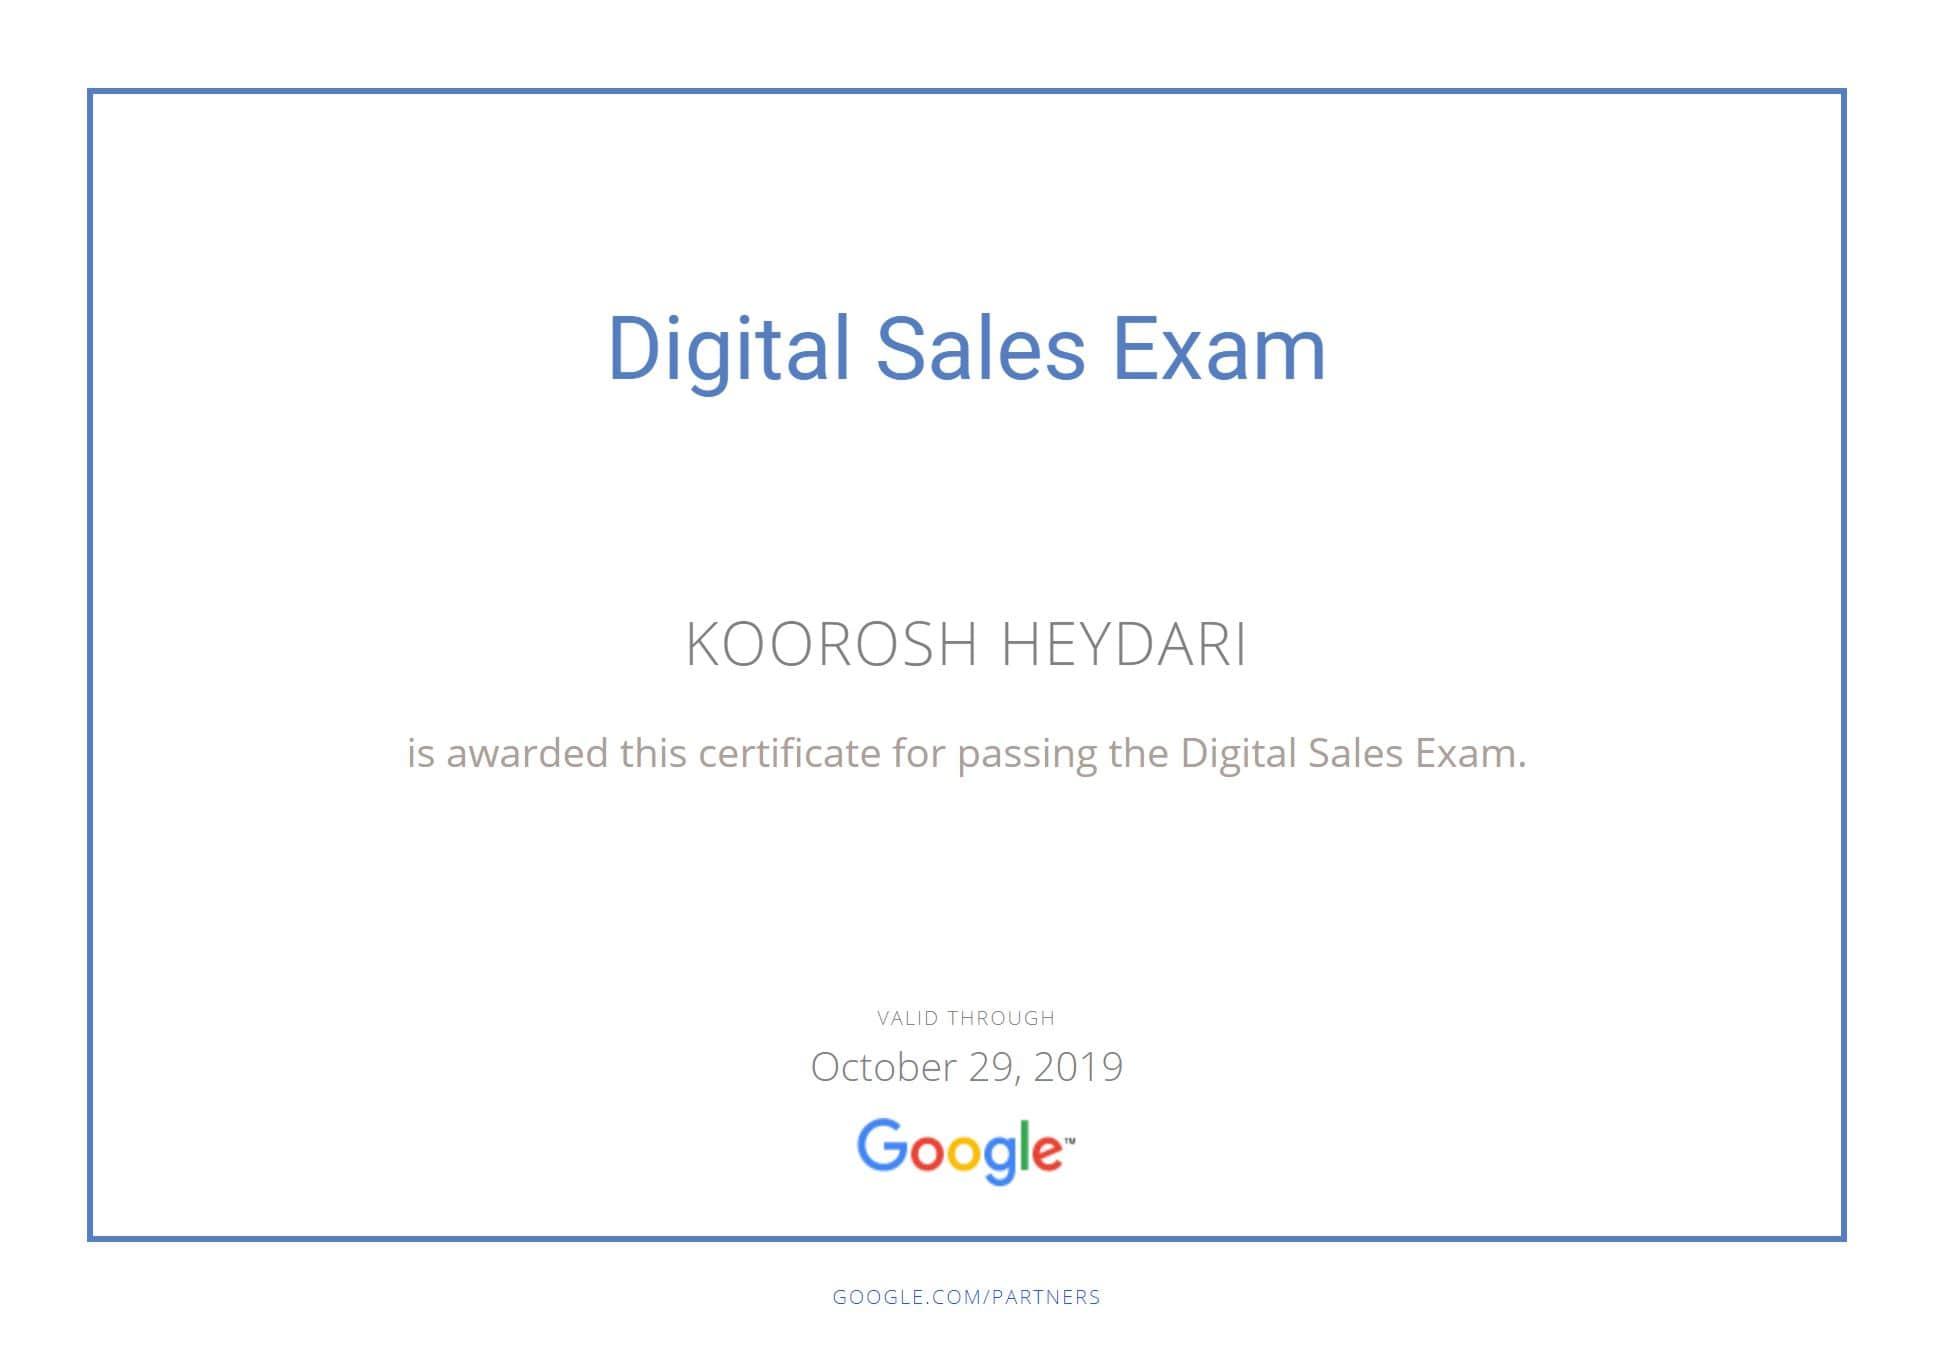 مدرک فروش دیجیتال گوگل